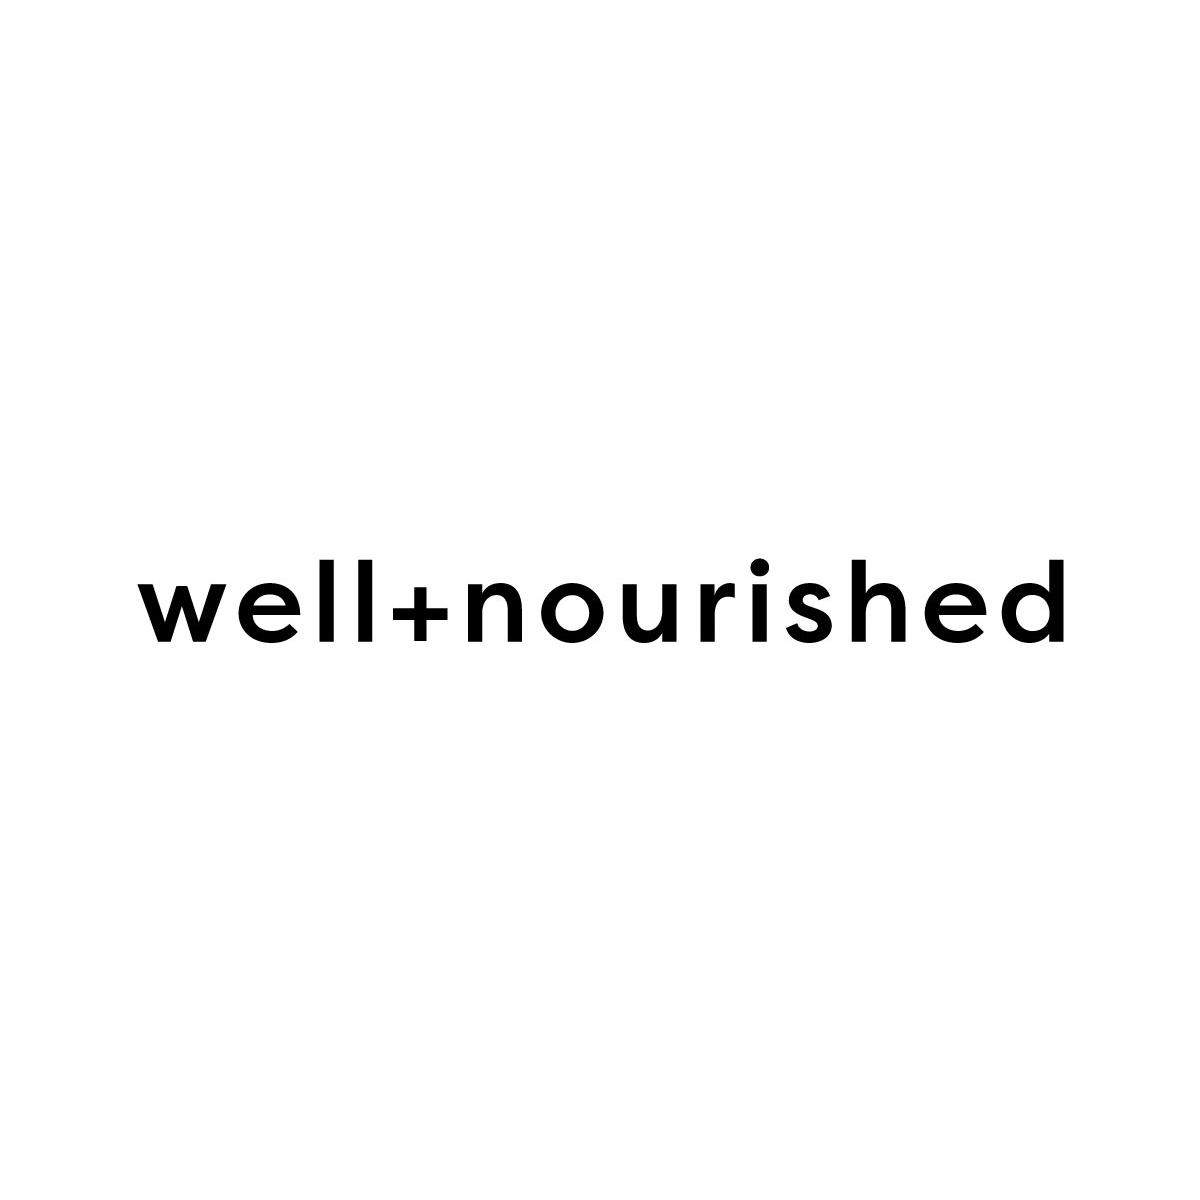 well+nourished-logo.jpg